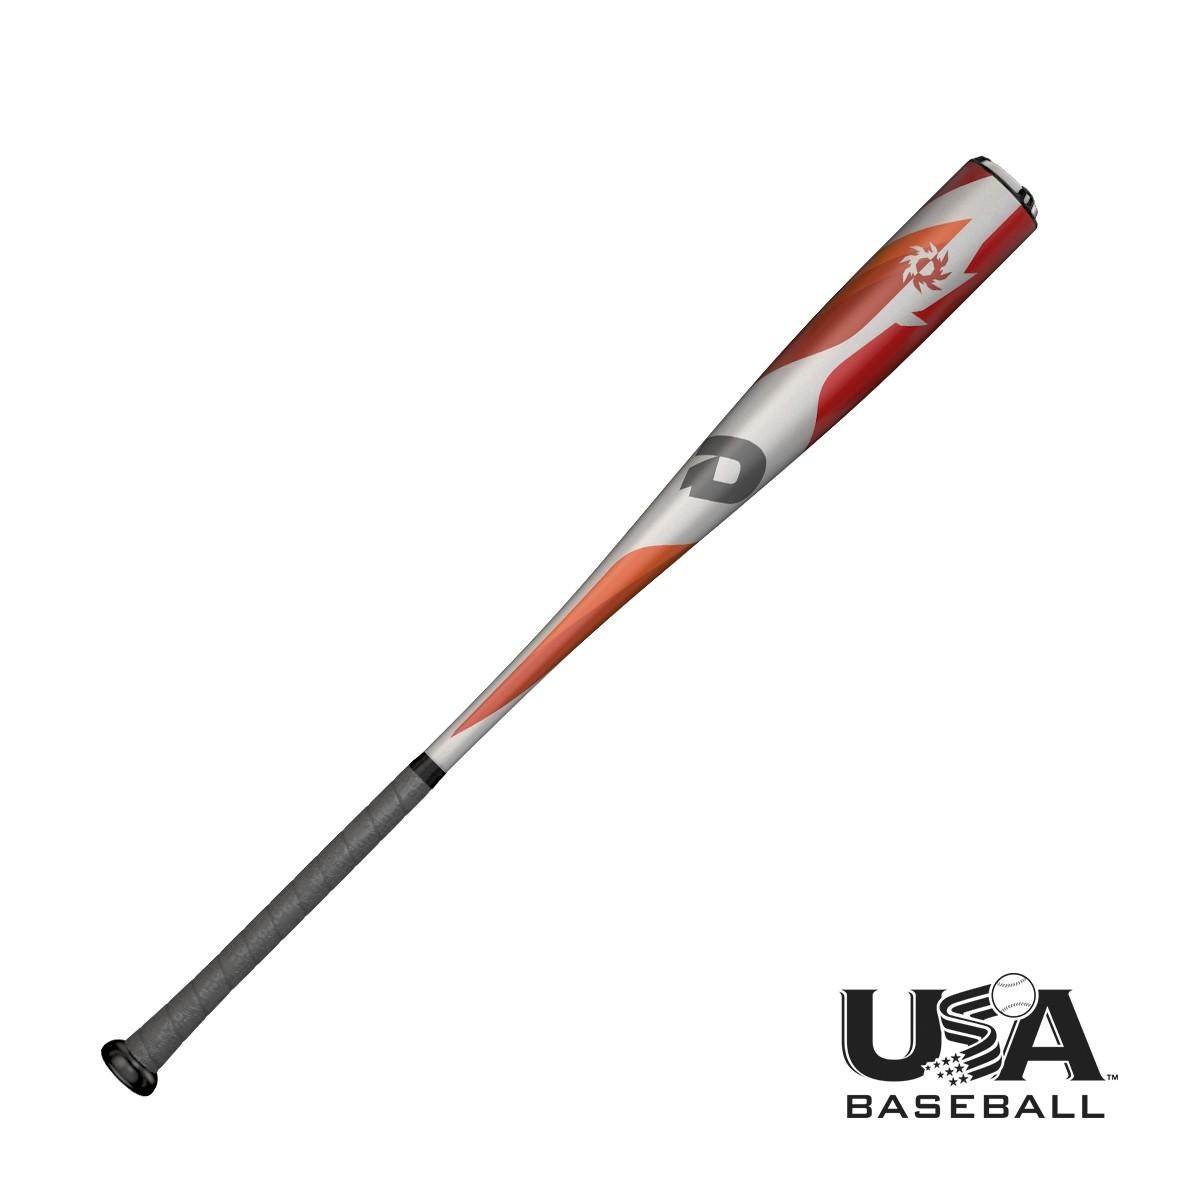 demarini-2018-voodoo-one-10-2-5-8-balanced-usa-baseball-bat-29-inch-19-oz WTDXUO21929-18 DeMarini 887768630034 `-10 length to weight ratio 2 5/8 inch barrel diameter Balanced